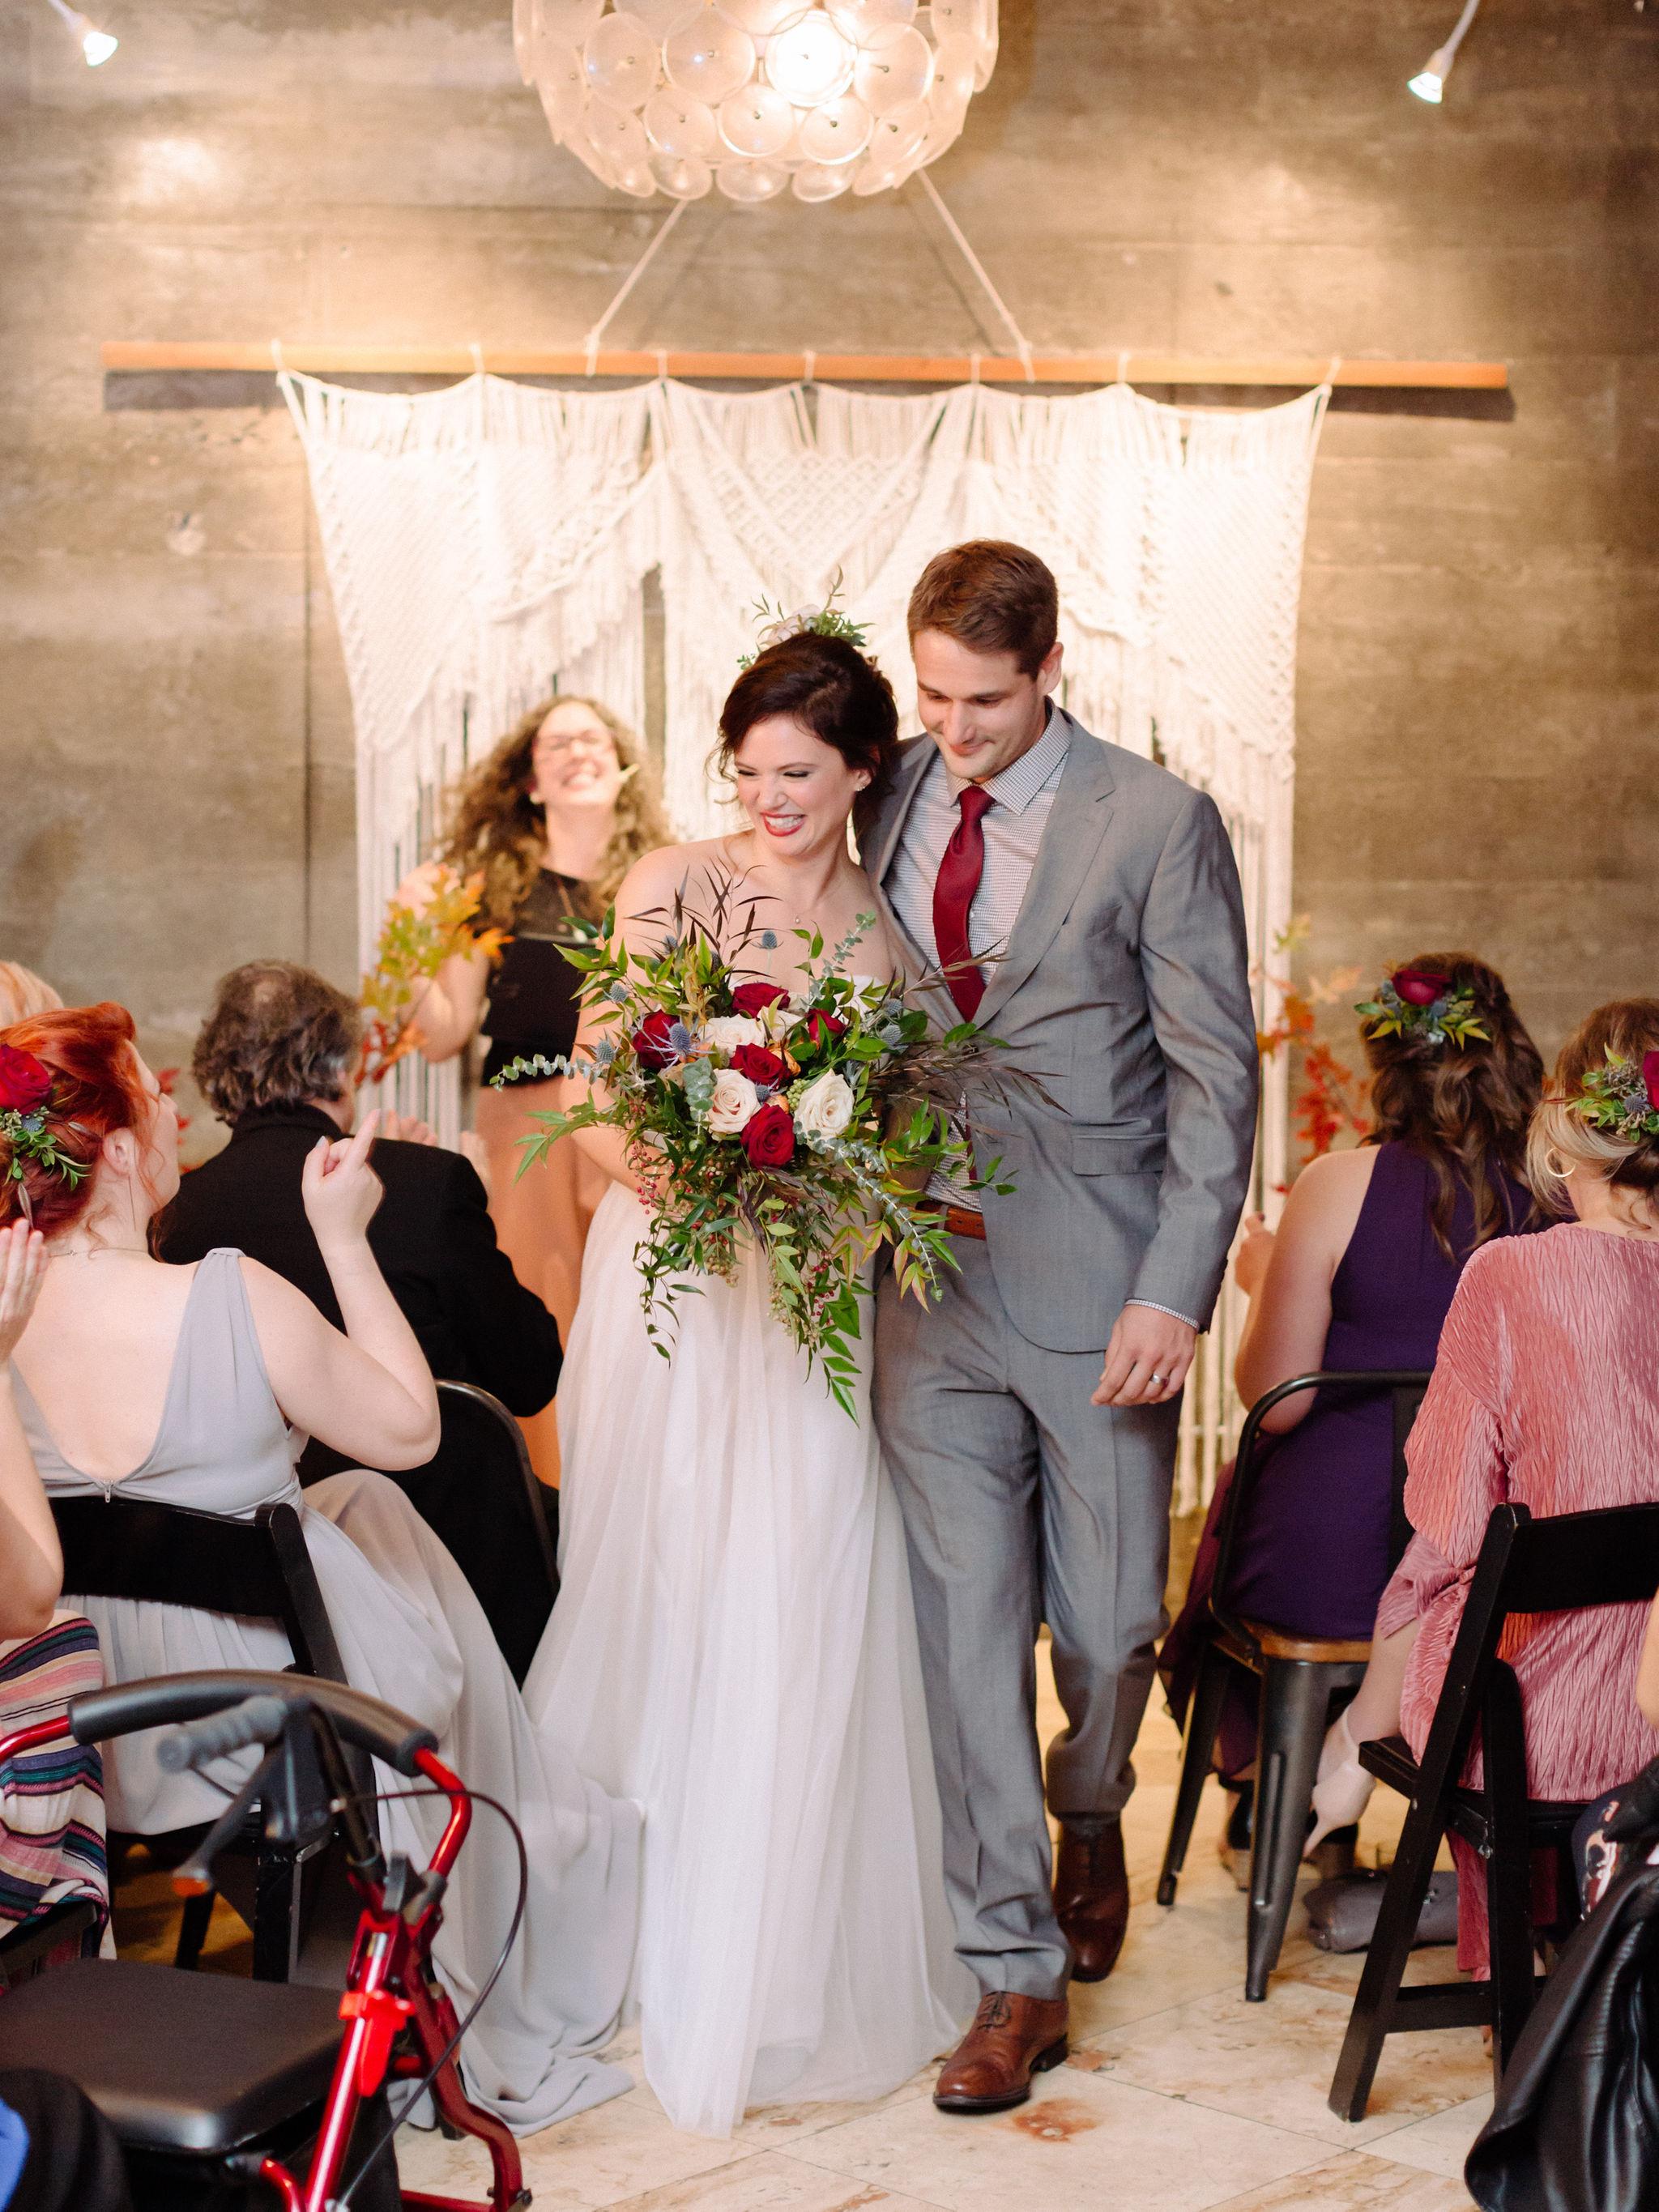 julie-and-adam-wedding-ceremony-61.jpg